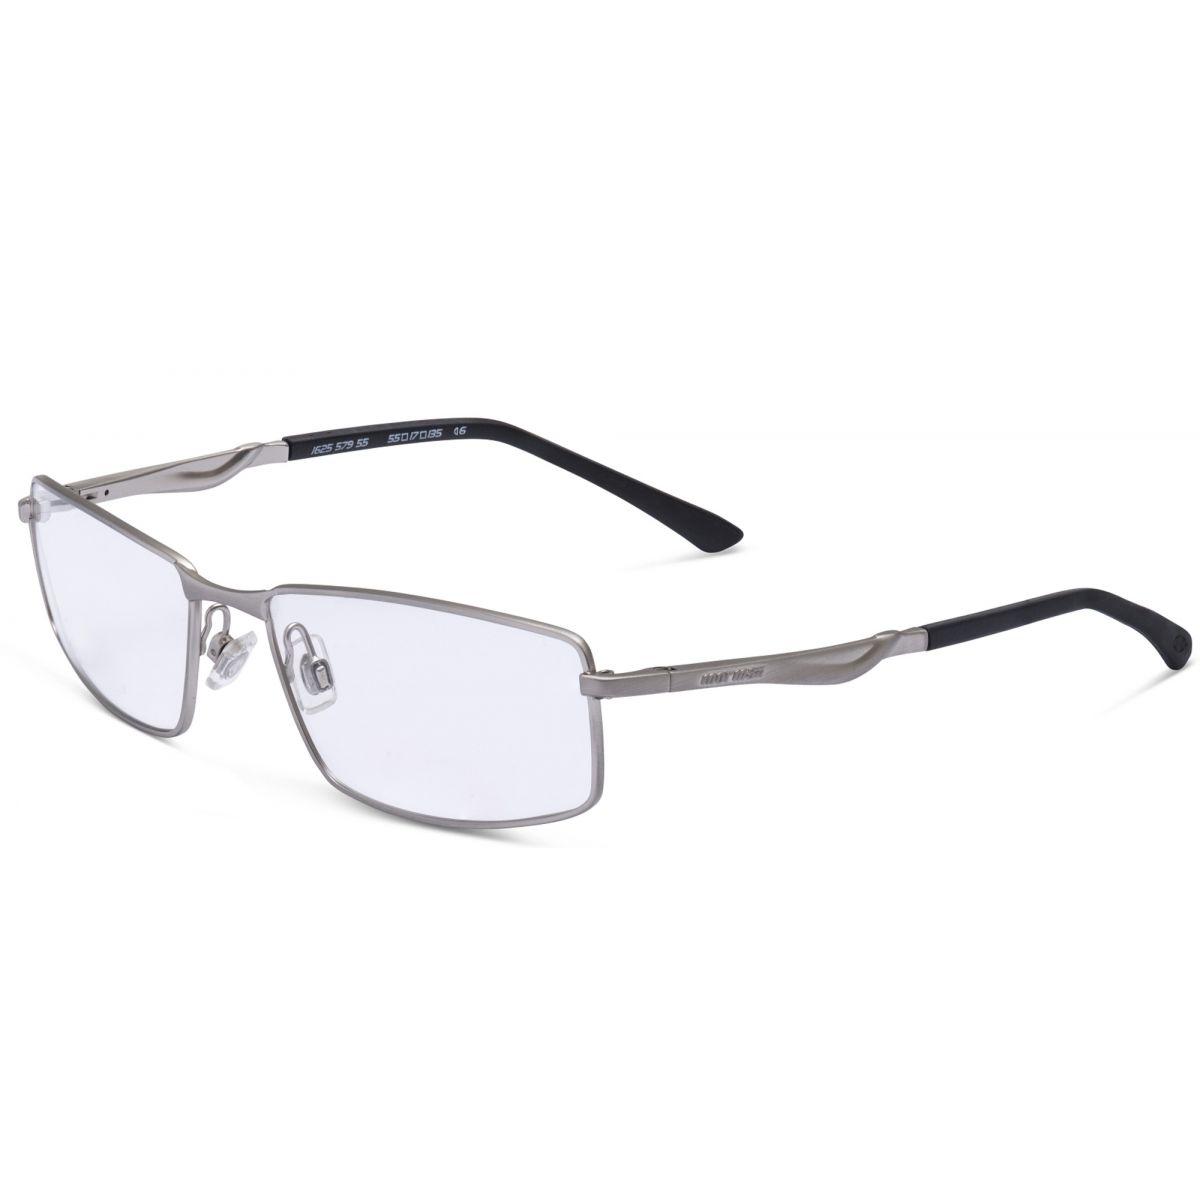 Óculos De Grau Masculino Mormaii MO1625 579 Tam.55MormaiiMormaii de ... 06a8274873